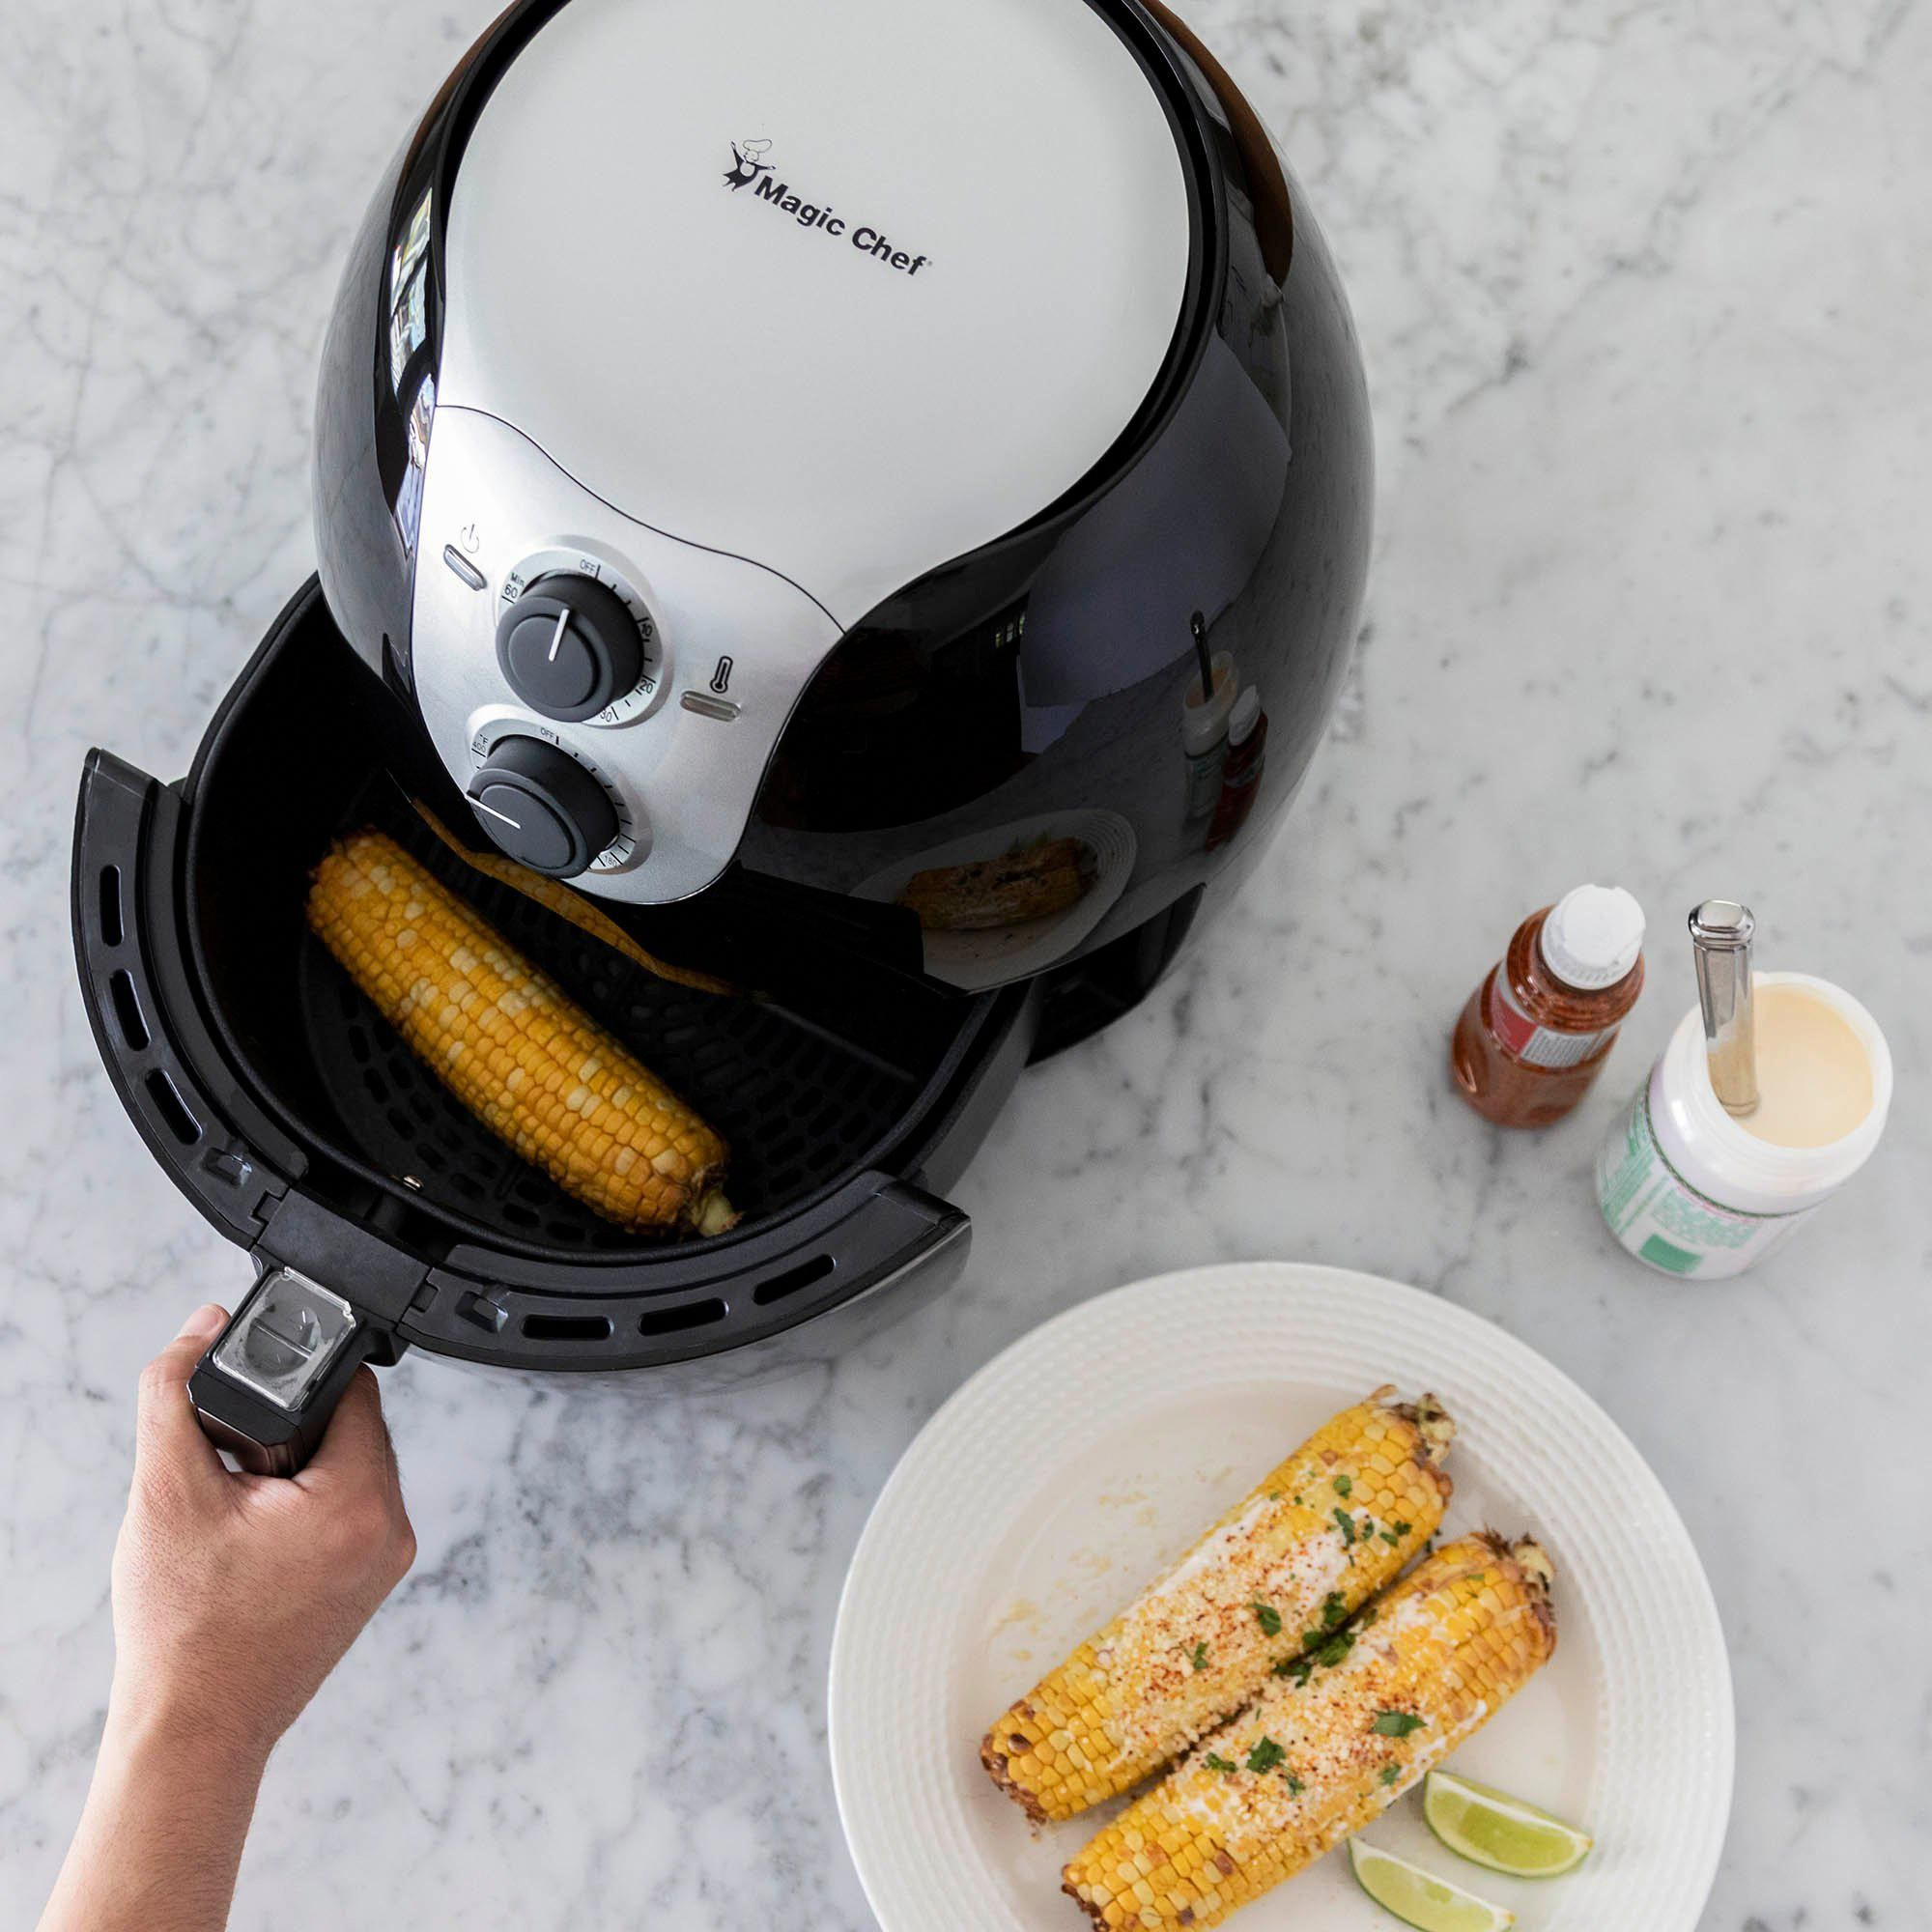 Magic Chef 5.6 Quart Black Manual Air Fryer Air fryer